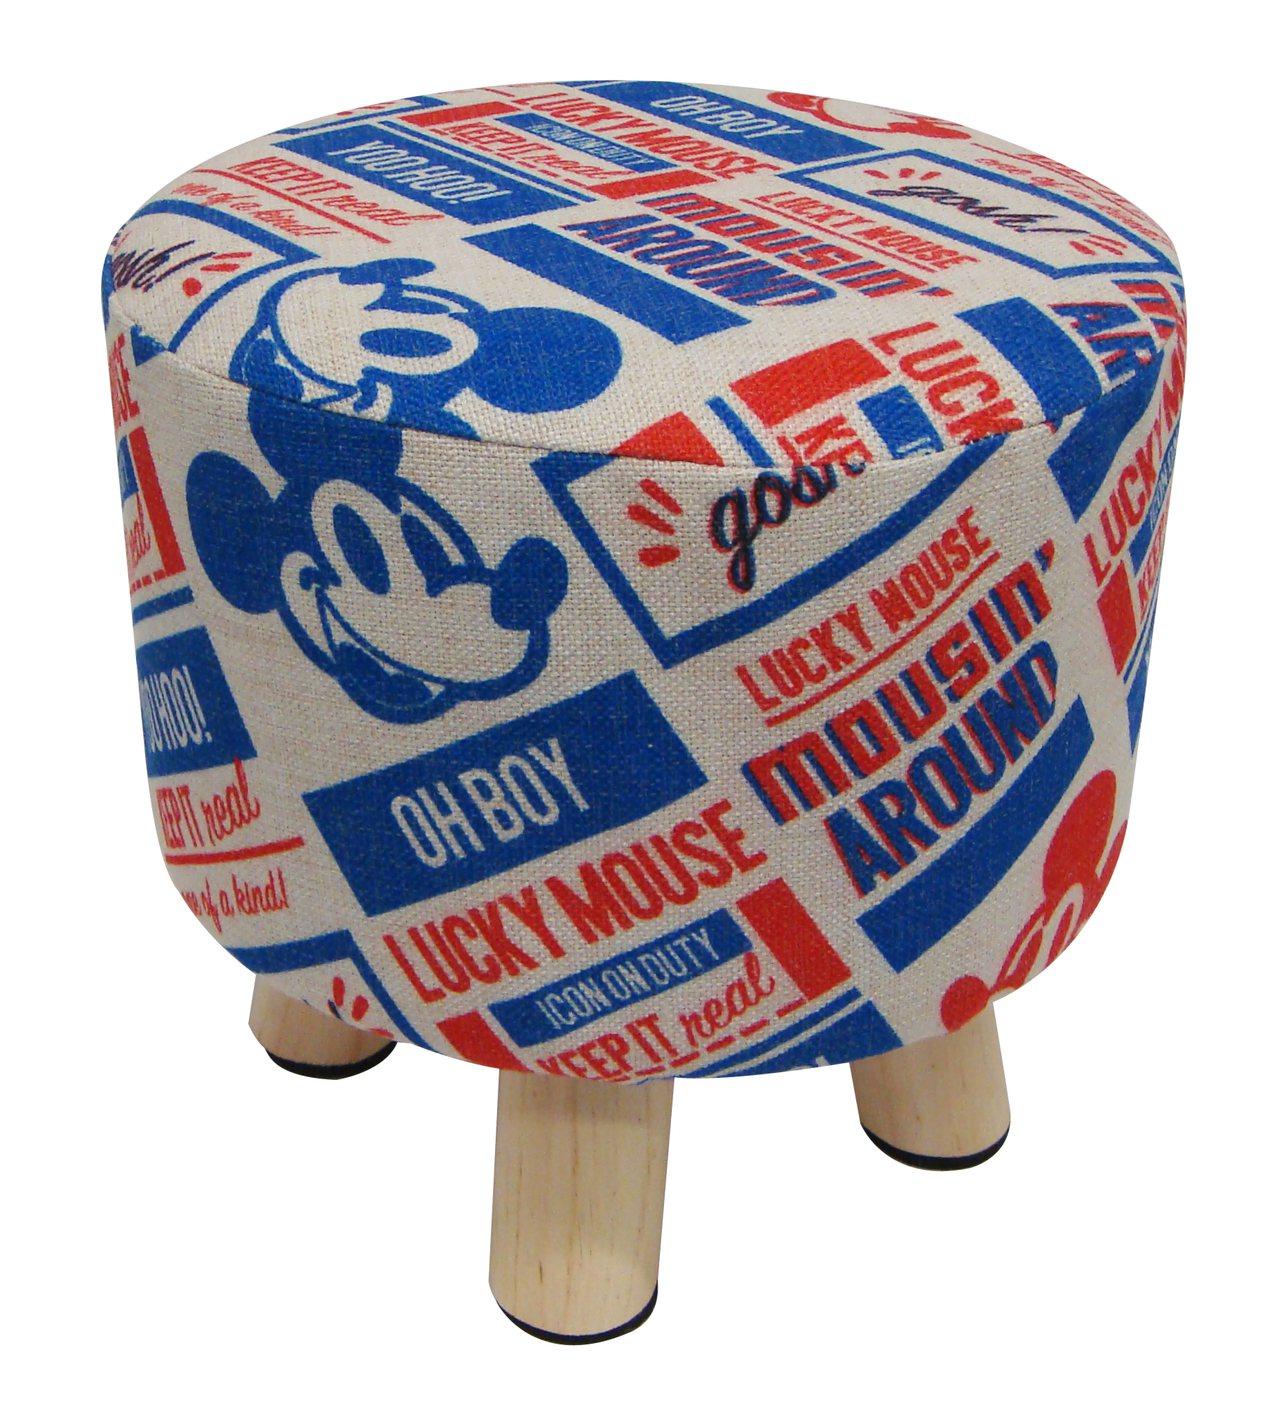 7-ELEVEN「米奇與好朋友主題店」販售多款獨家限定商品,圖為米奇造型小圓凳,...